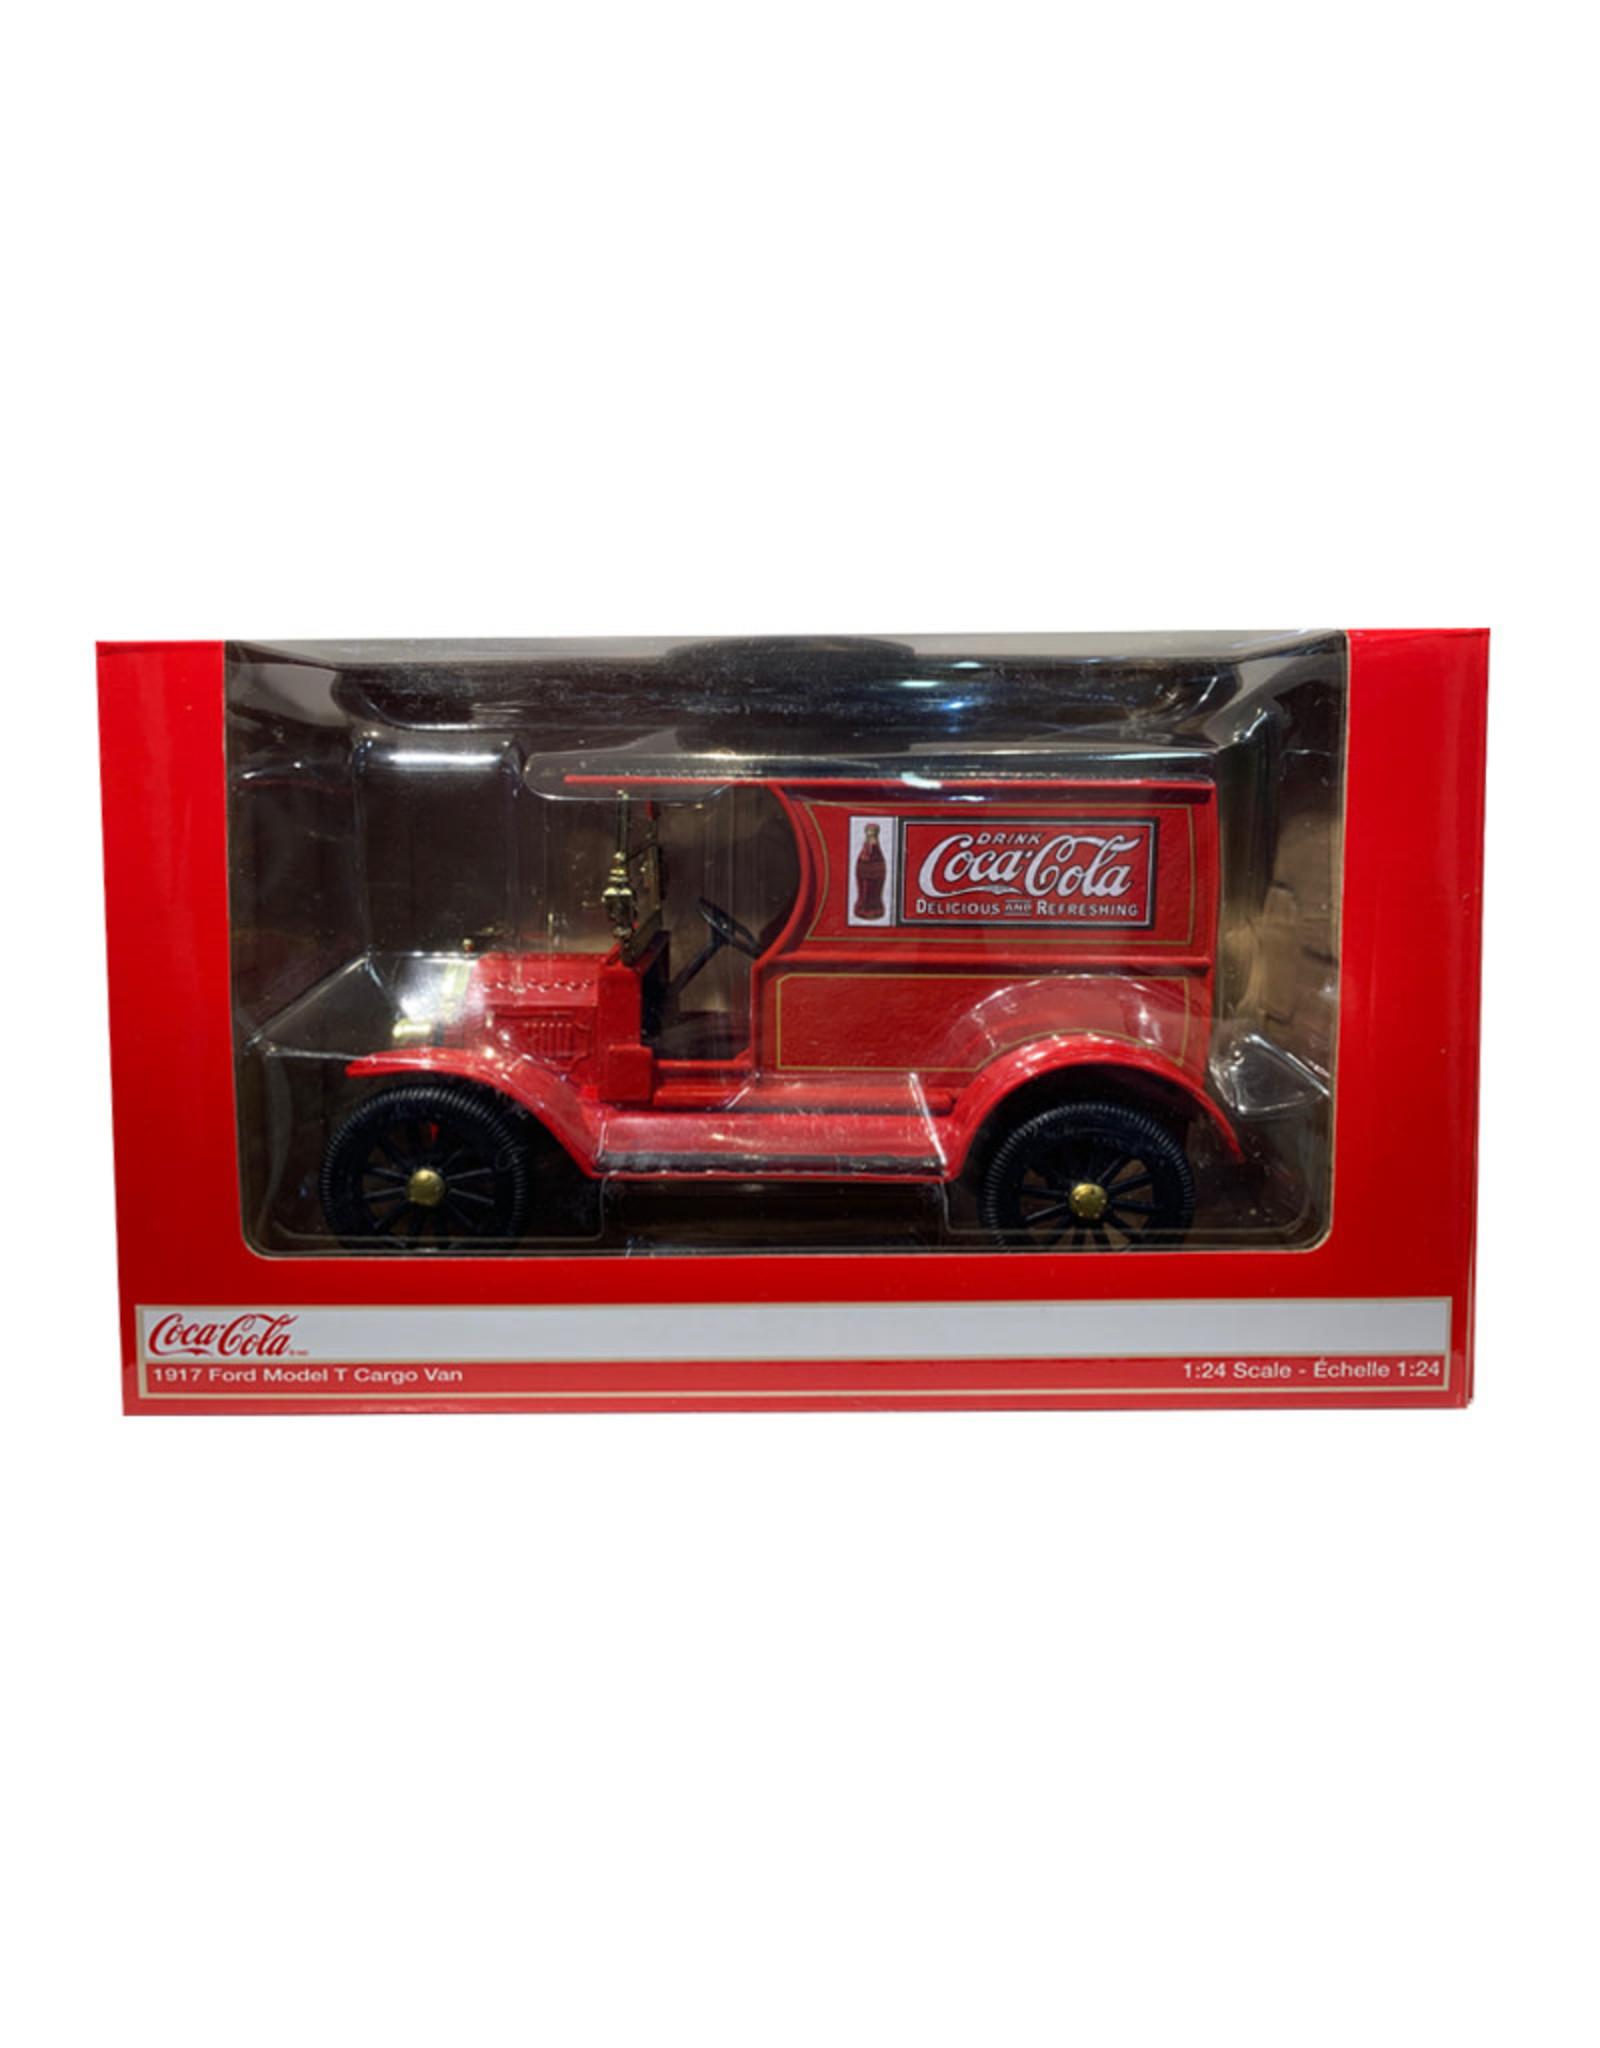 Coca-Cola Coca-Cola ( Die Cast ) 1917 Ford Model T Cargo Van